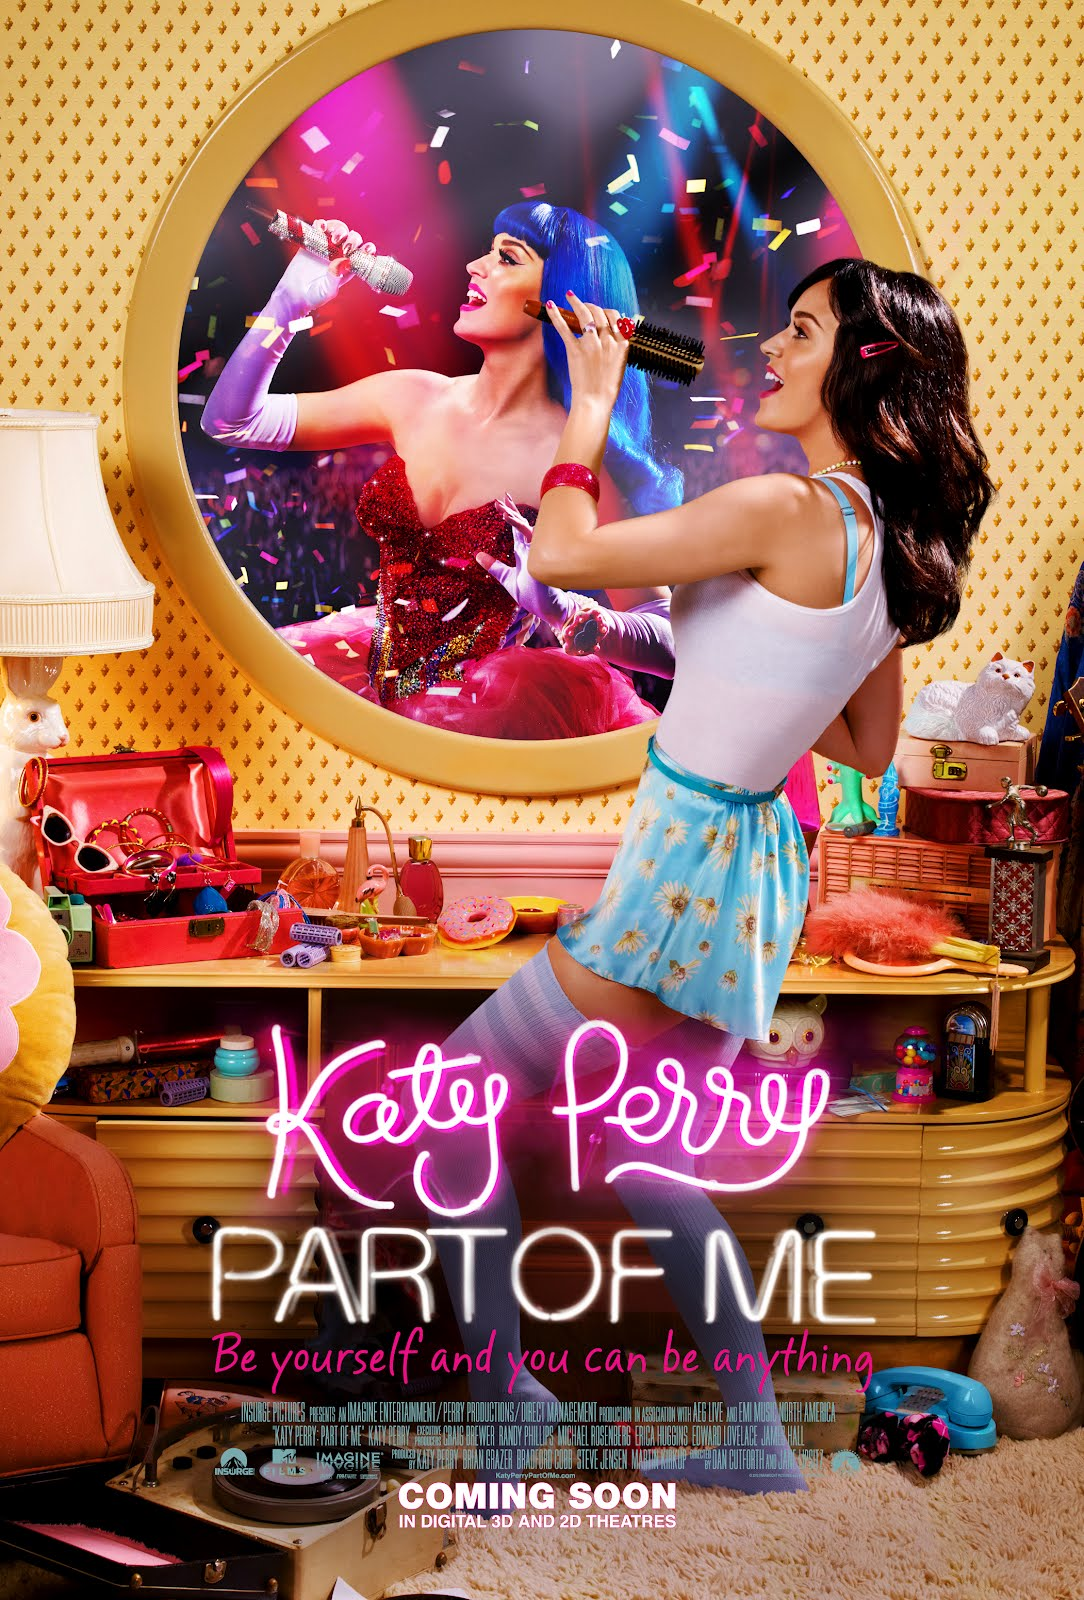 http://2.bp.blogspot.com/-5o7XurjawmY/UAsQWqD6g-I/AAAAAAAADro/tVaFyEVKzT0/s1600/Katy_Perry_Part_of_Me.jpg